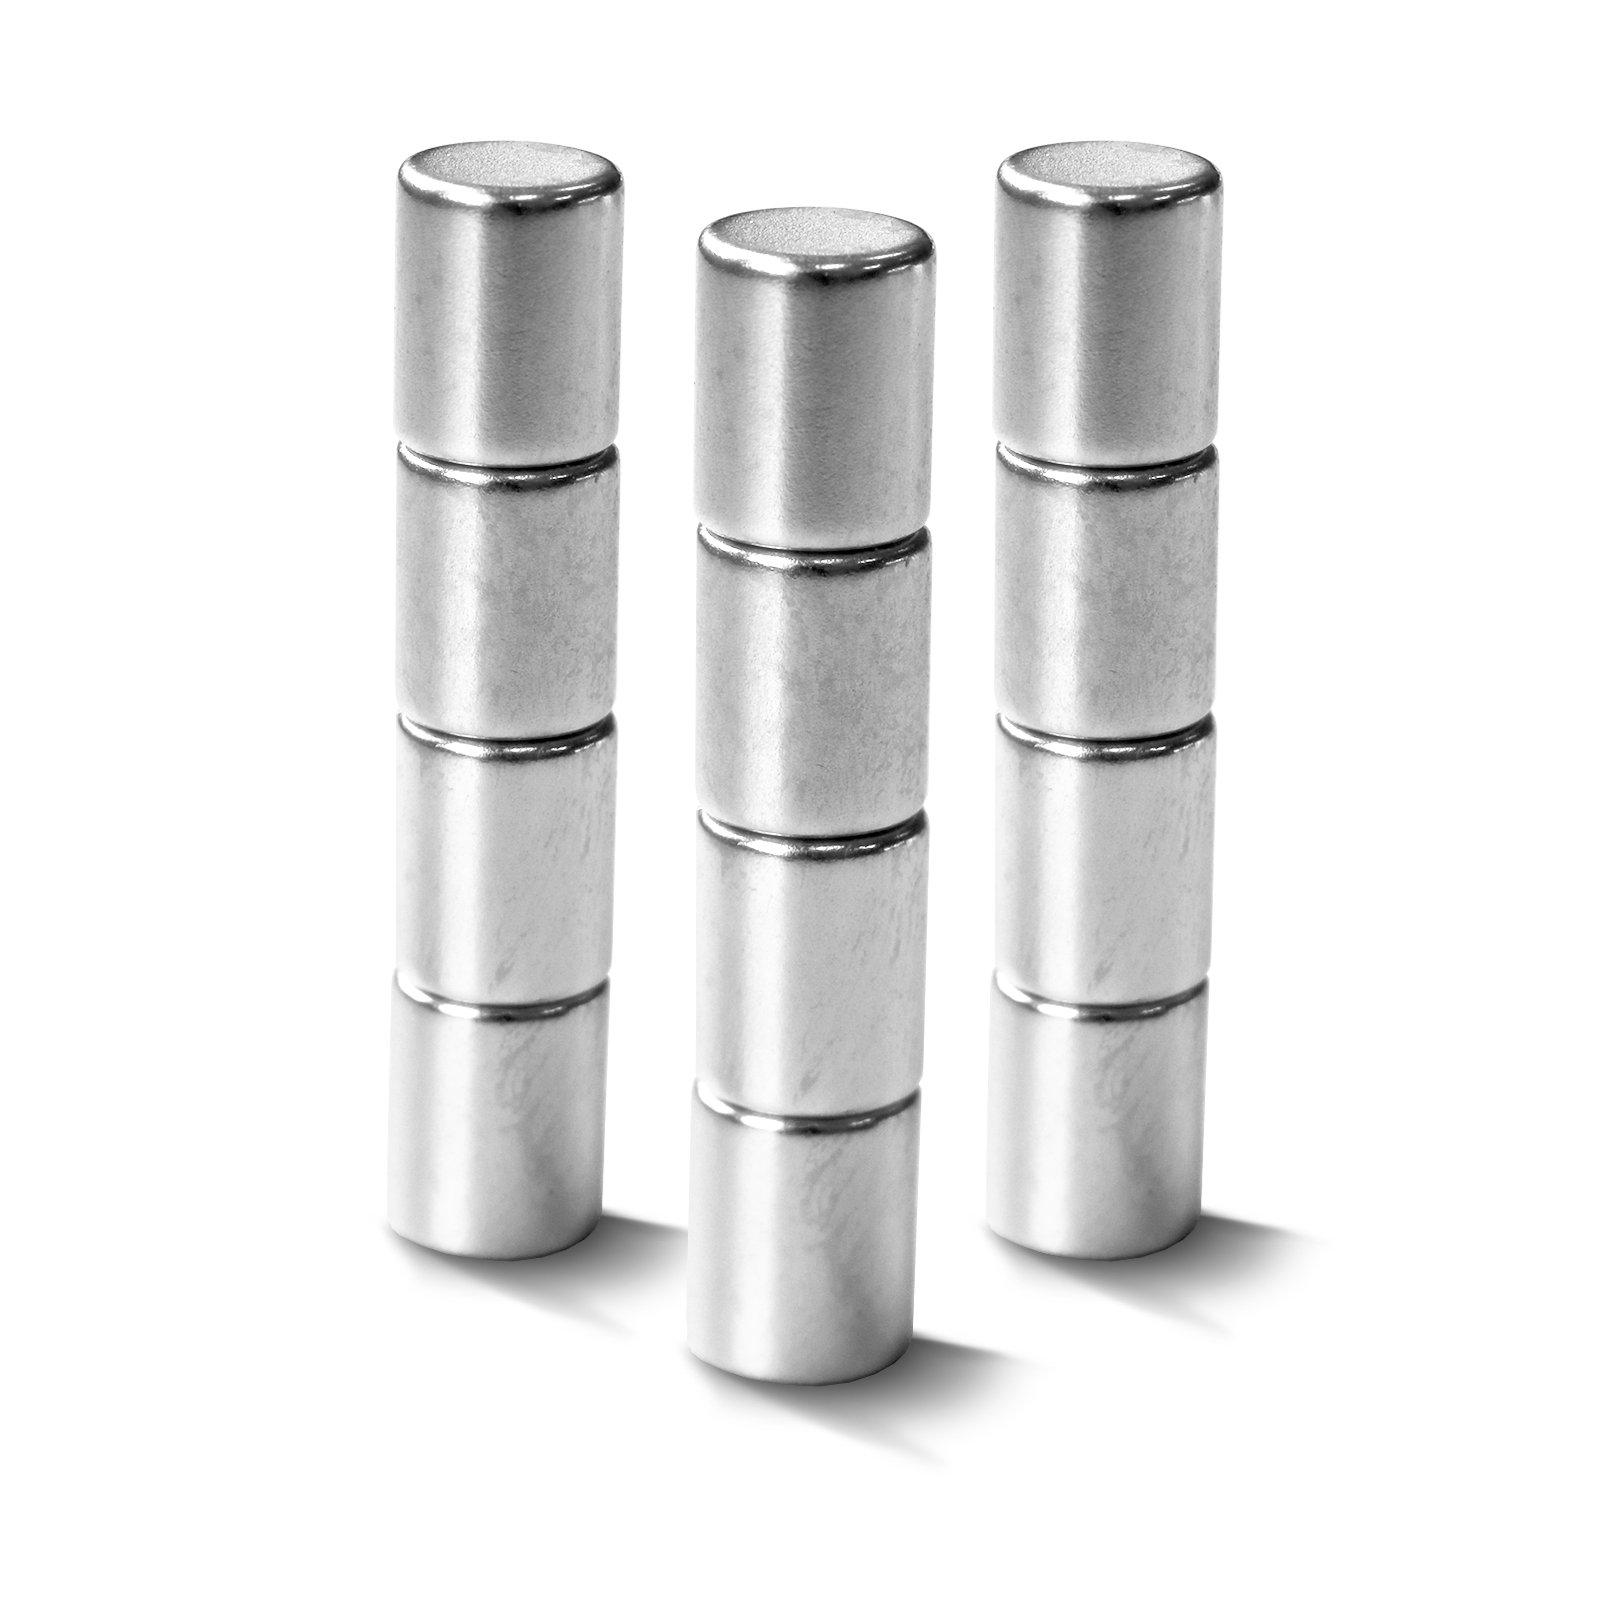 Präsentations-zubehör Neodym Magnet Super Magnet Stark Hohe Haftkraft Würfel 3mm Pinwand Memoboard Hindernis Entfernen